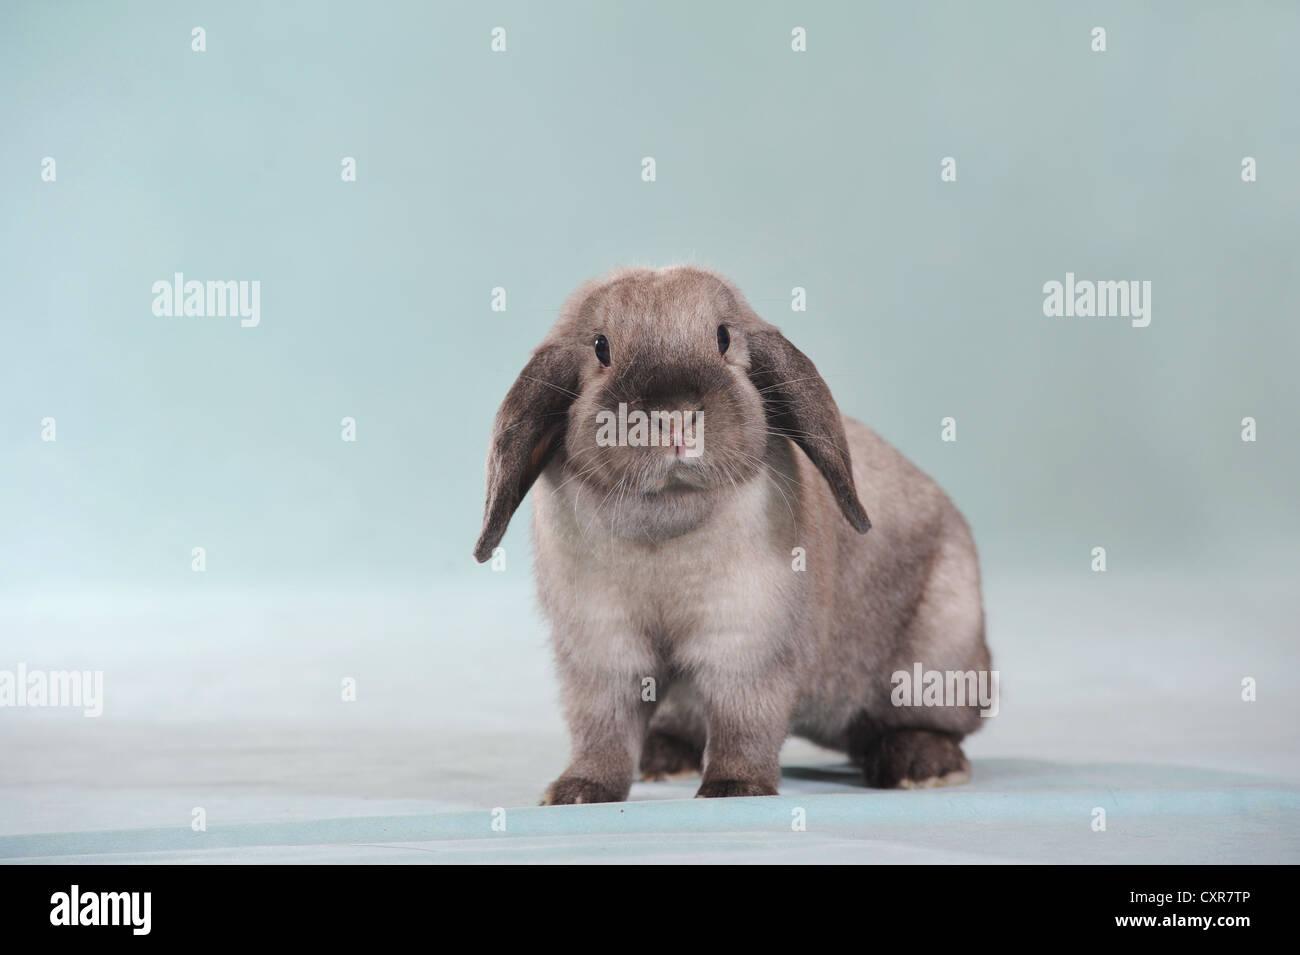 Grey long eared rabbit - Stock Image